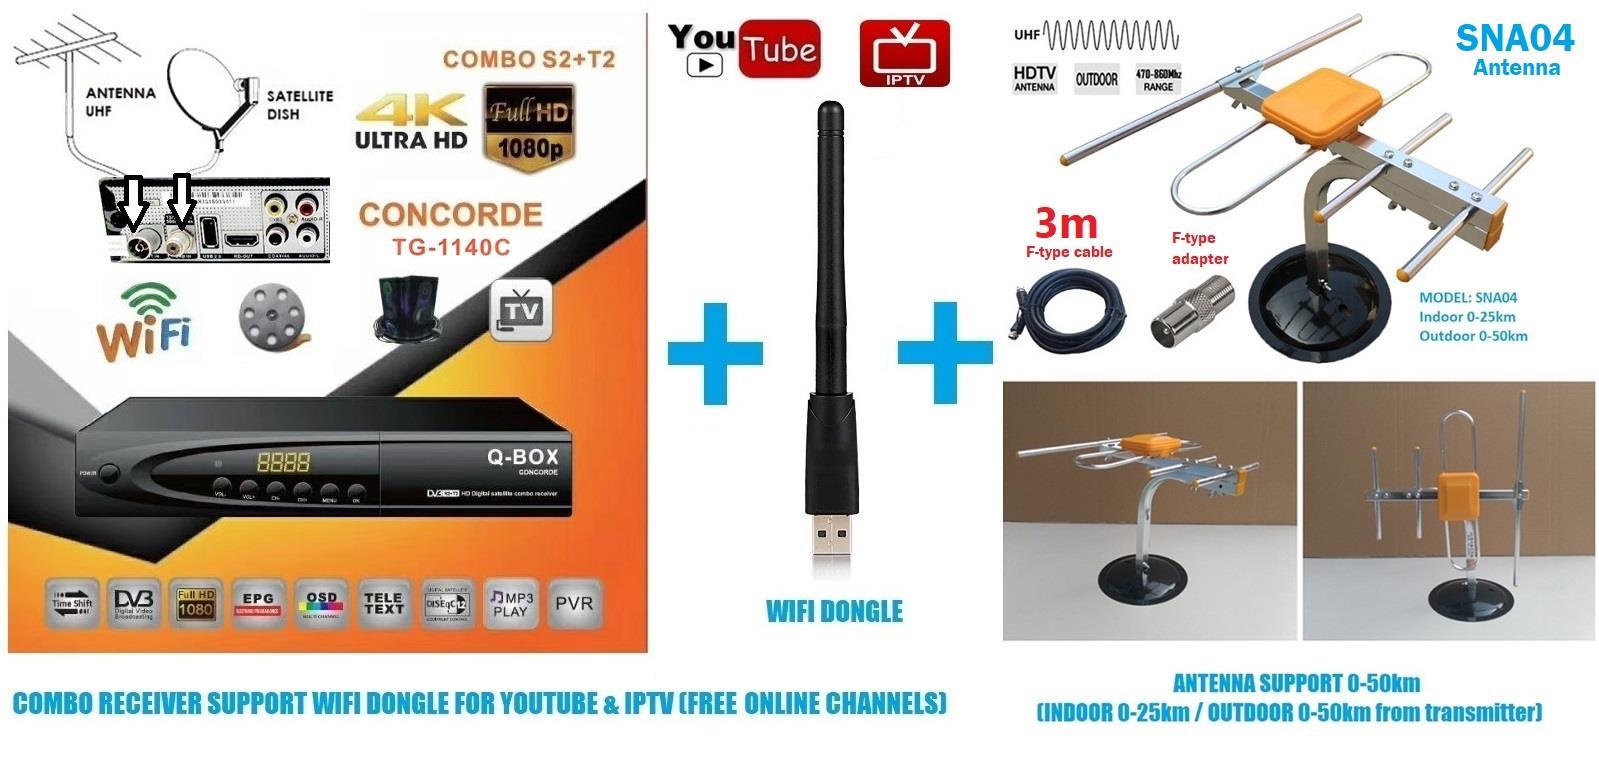 HDTV WIFI IPTV COMBO DIGITAL TV RECEIVER & PVR RECORDER freesat